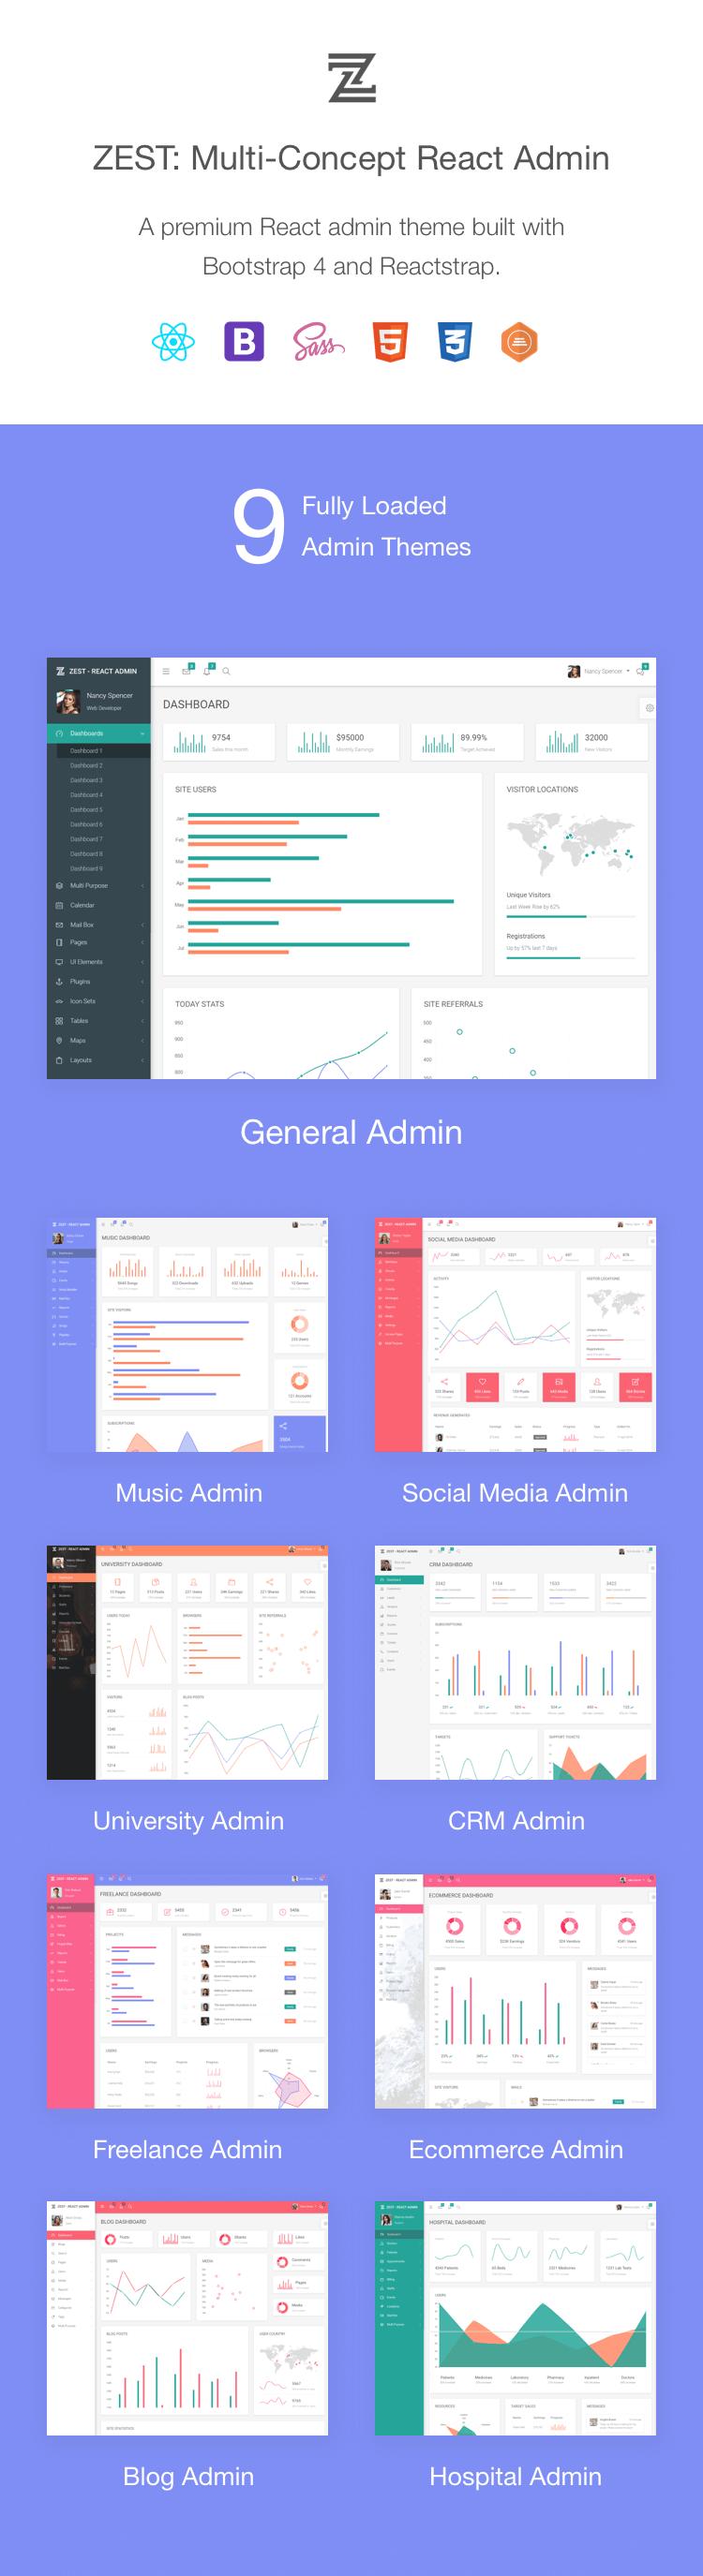 Zest: Multi-Concept React Admin Template - 1